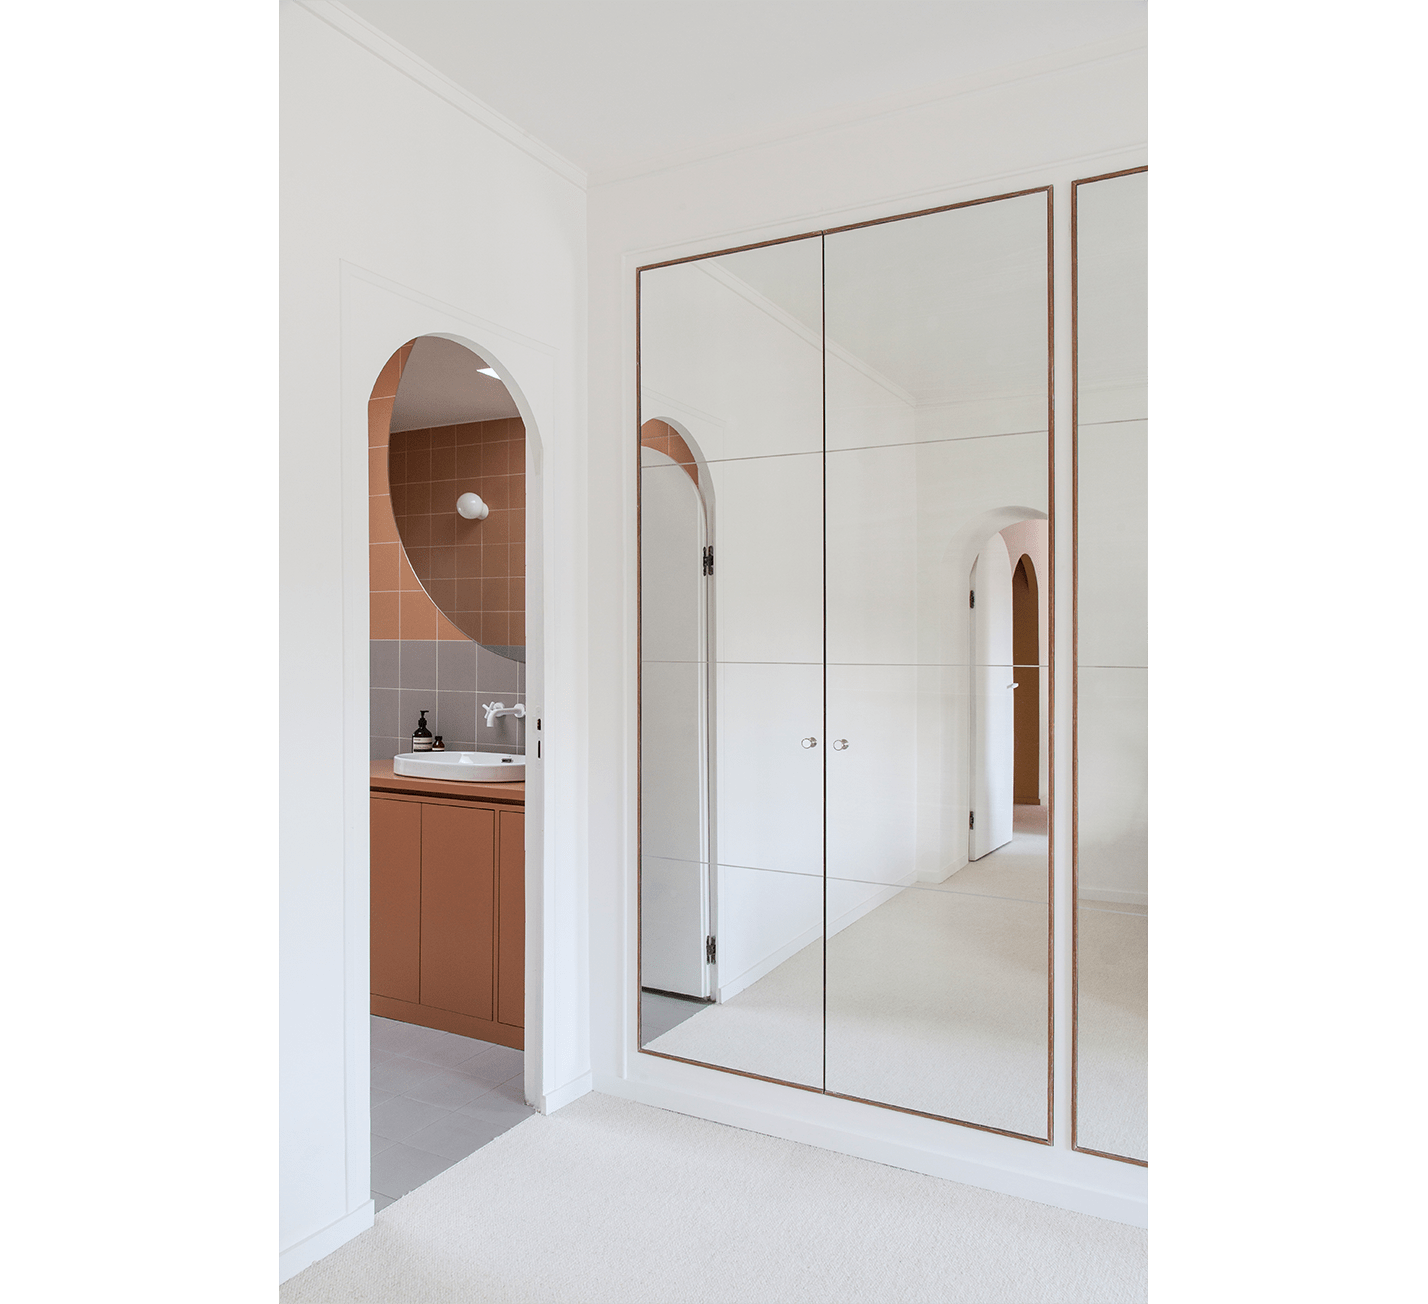 Projet-Arlequin-Atelier-Steve-Pauline-Borgia-Architecture-interieur-09-min